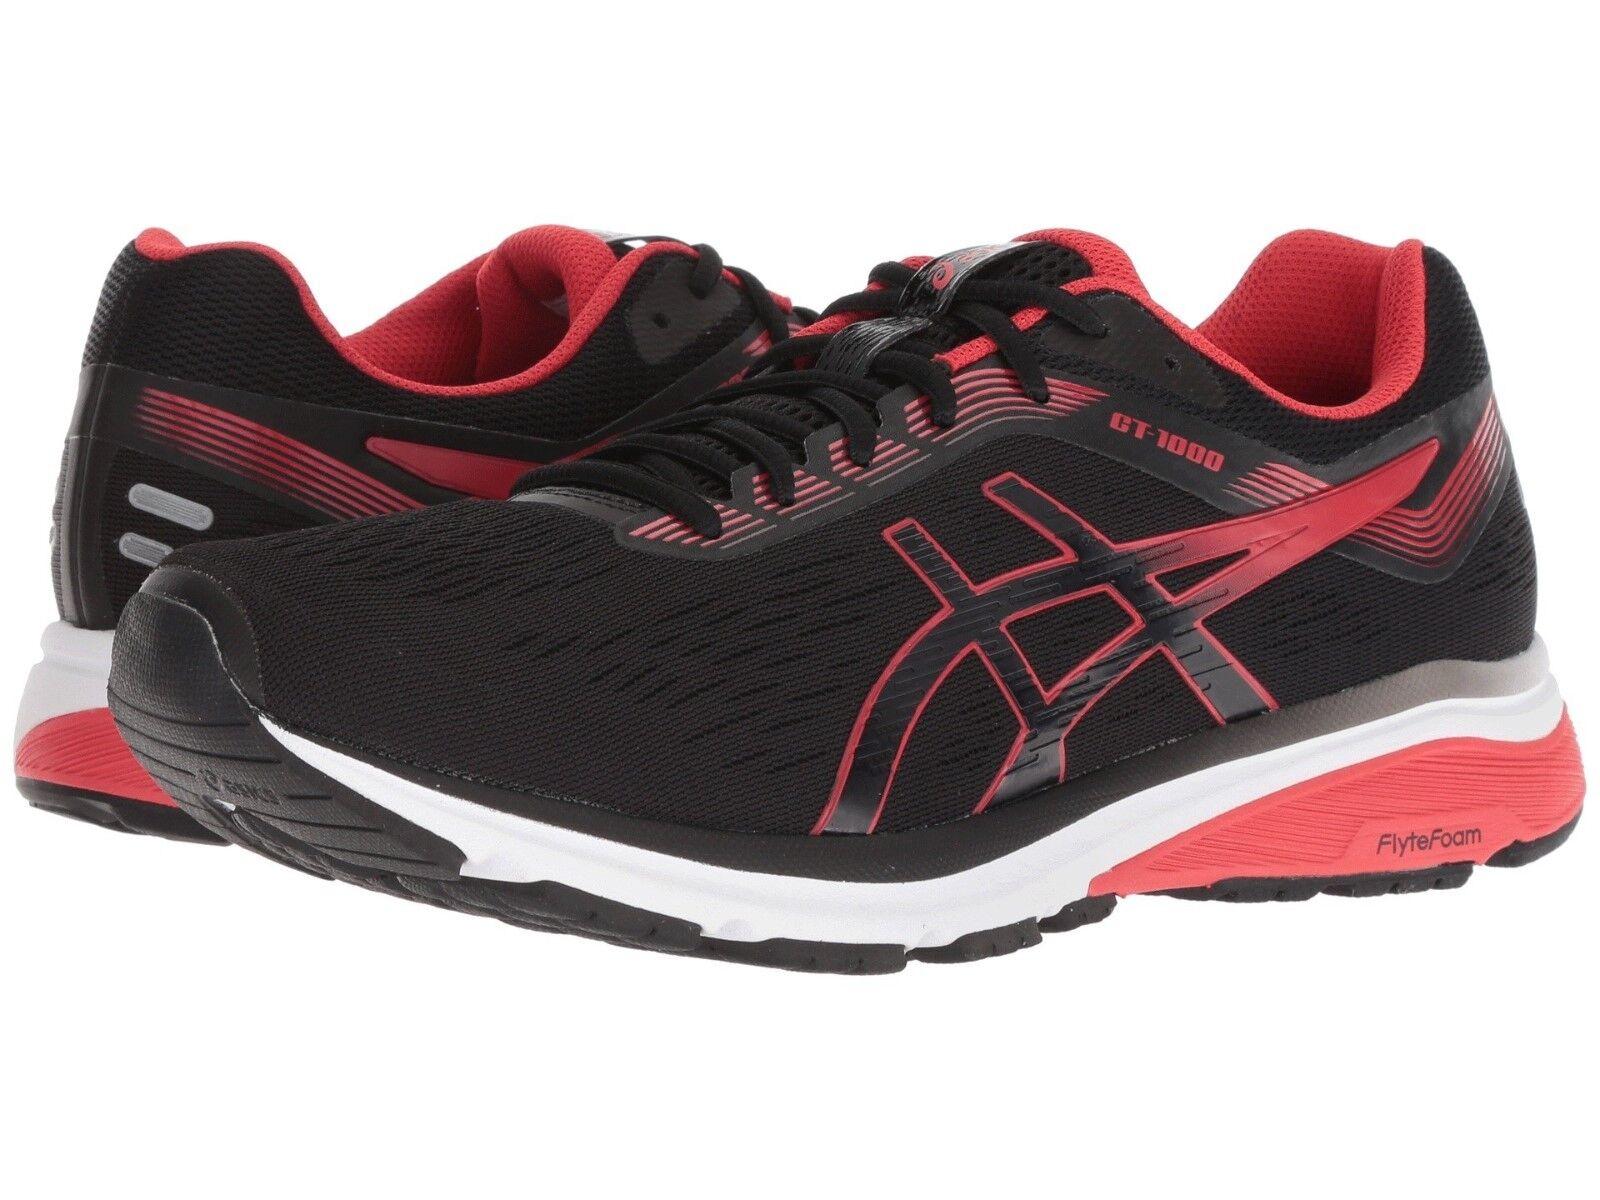 Asics - Men GT 1000 7 Running Shoes Sneakers, Black D) Red Alert Medium (M, D) Black 1acb1c